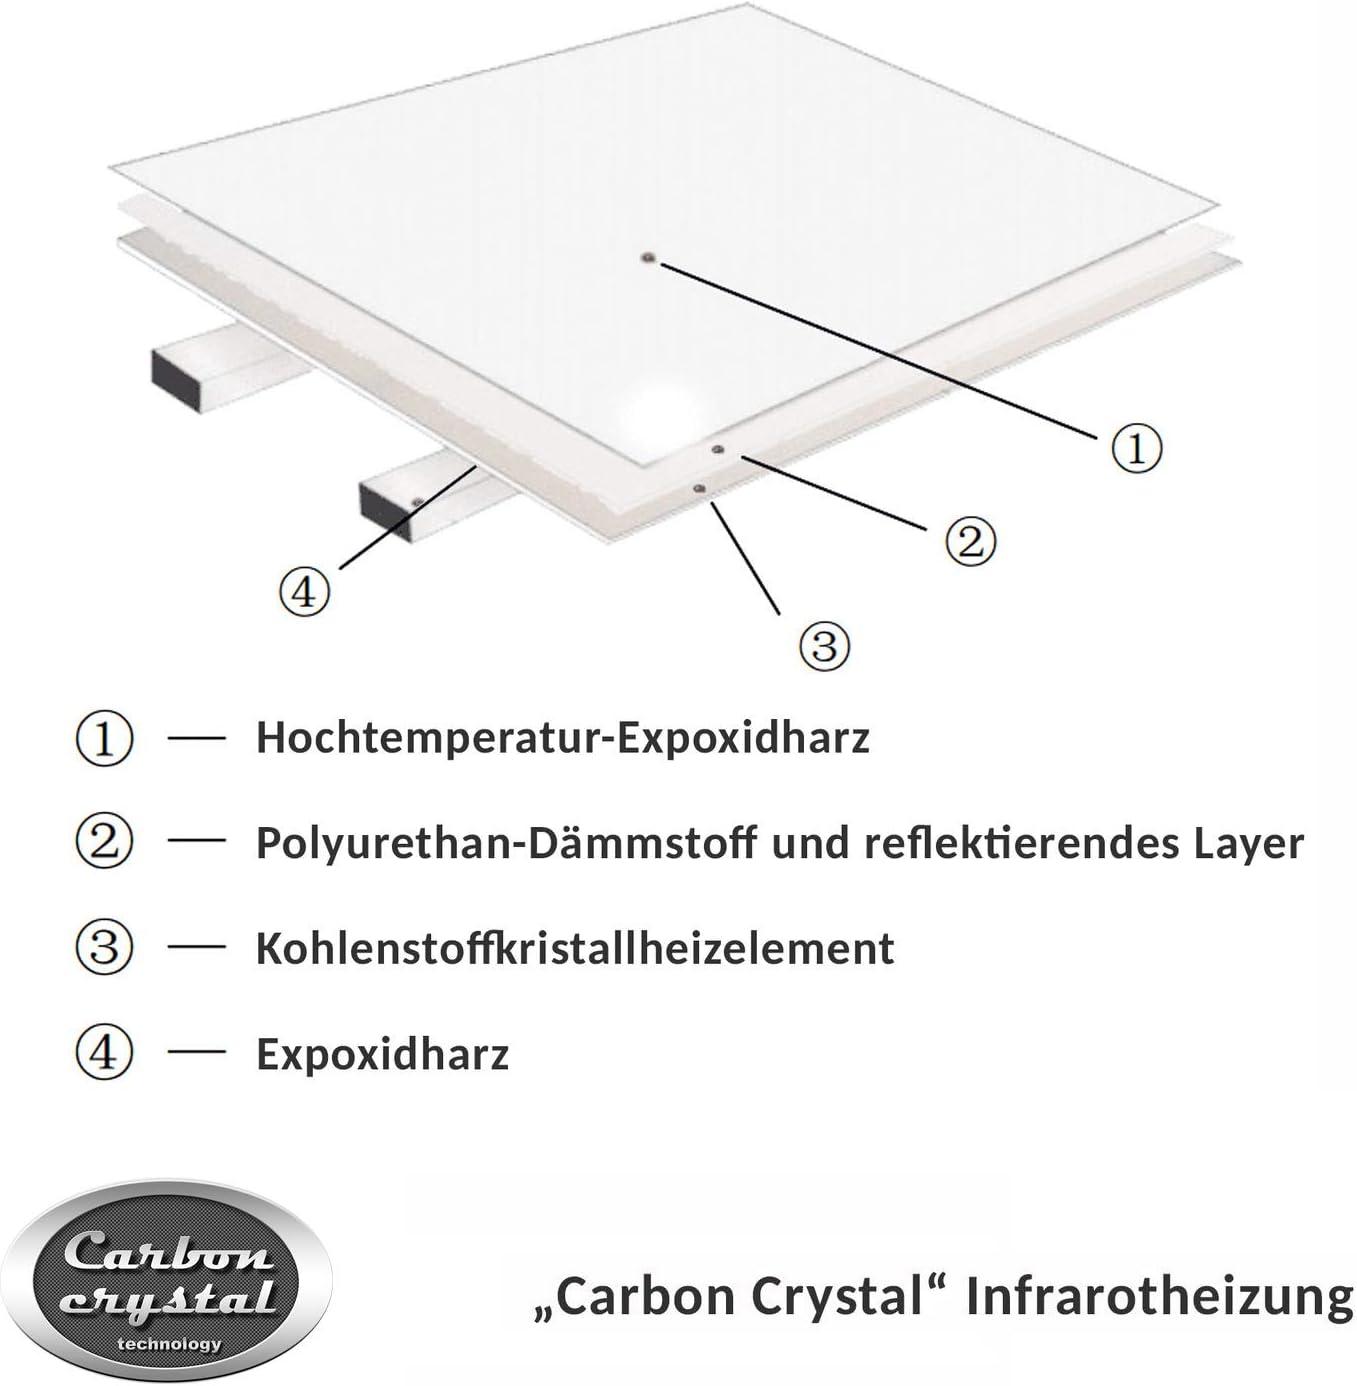 Viesta H500 panneau de chauffage infrarouge Crystal Carbon panneau radiateur ultra mince chauffage mural blanc 500 Watt derni/ère technologie